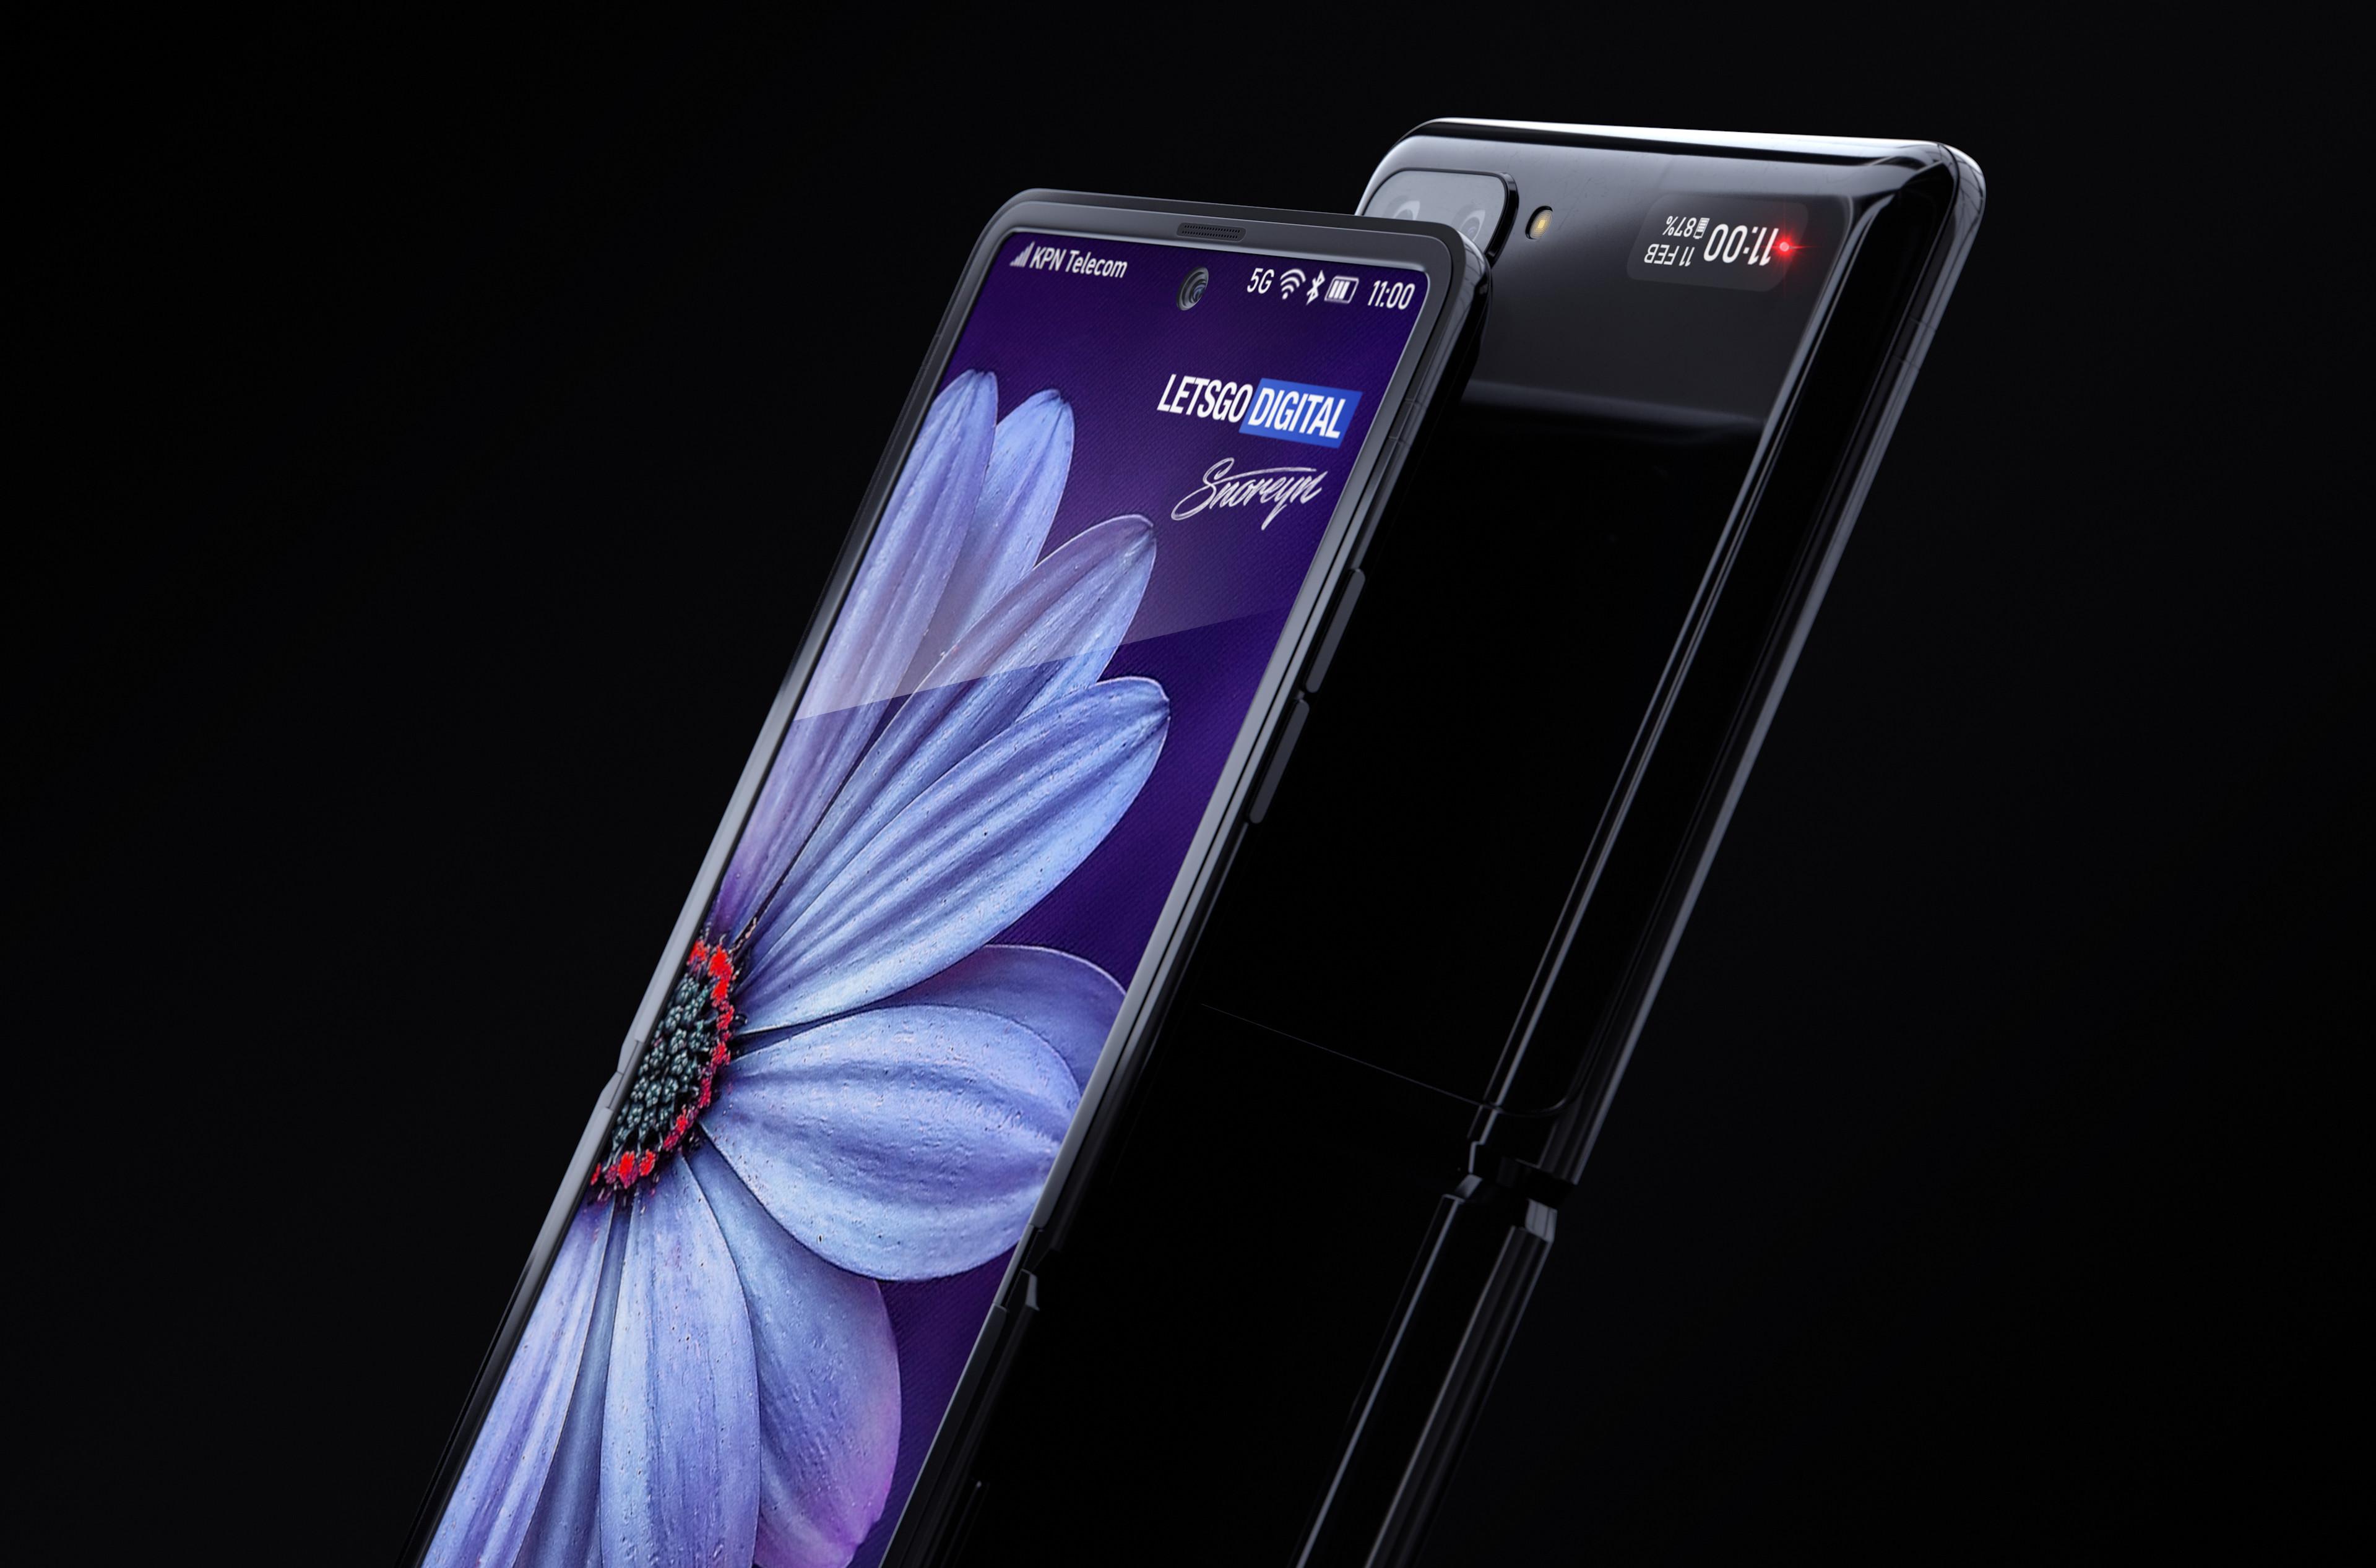 Samsung Galaxy Z Flip Foldable Smartphone Letsgodigital